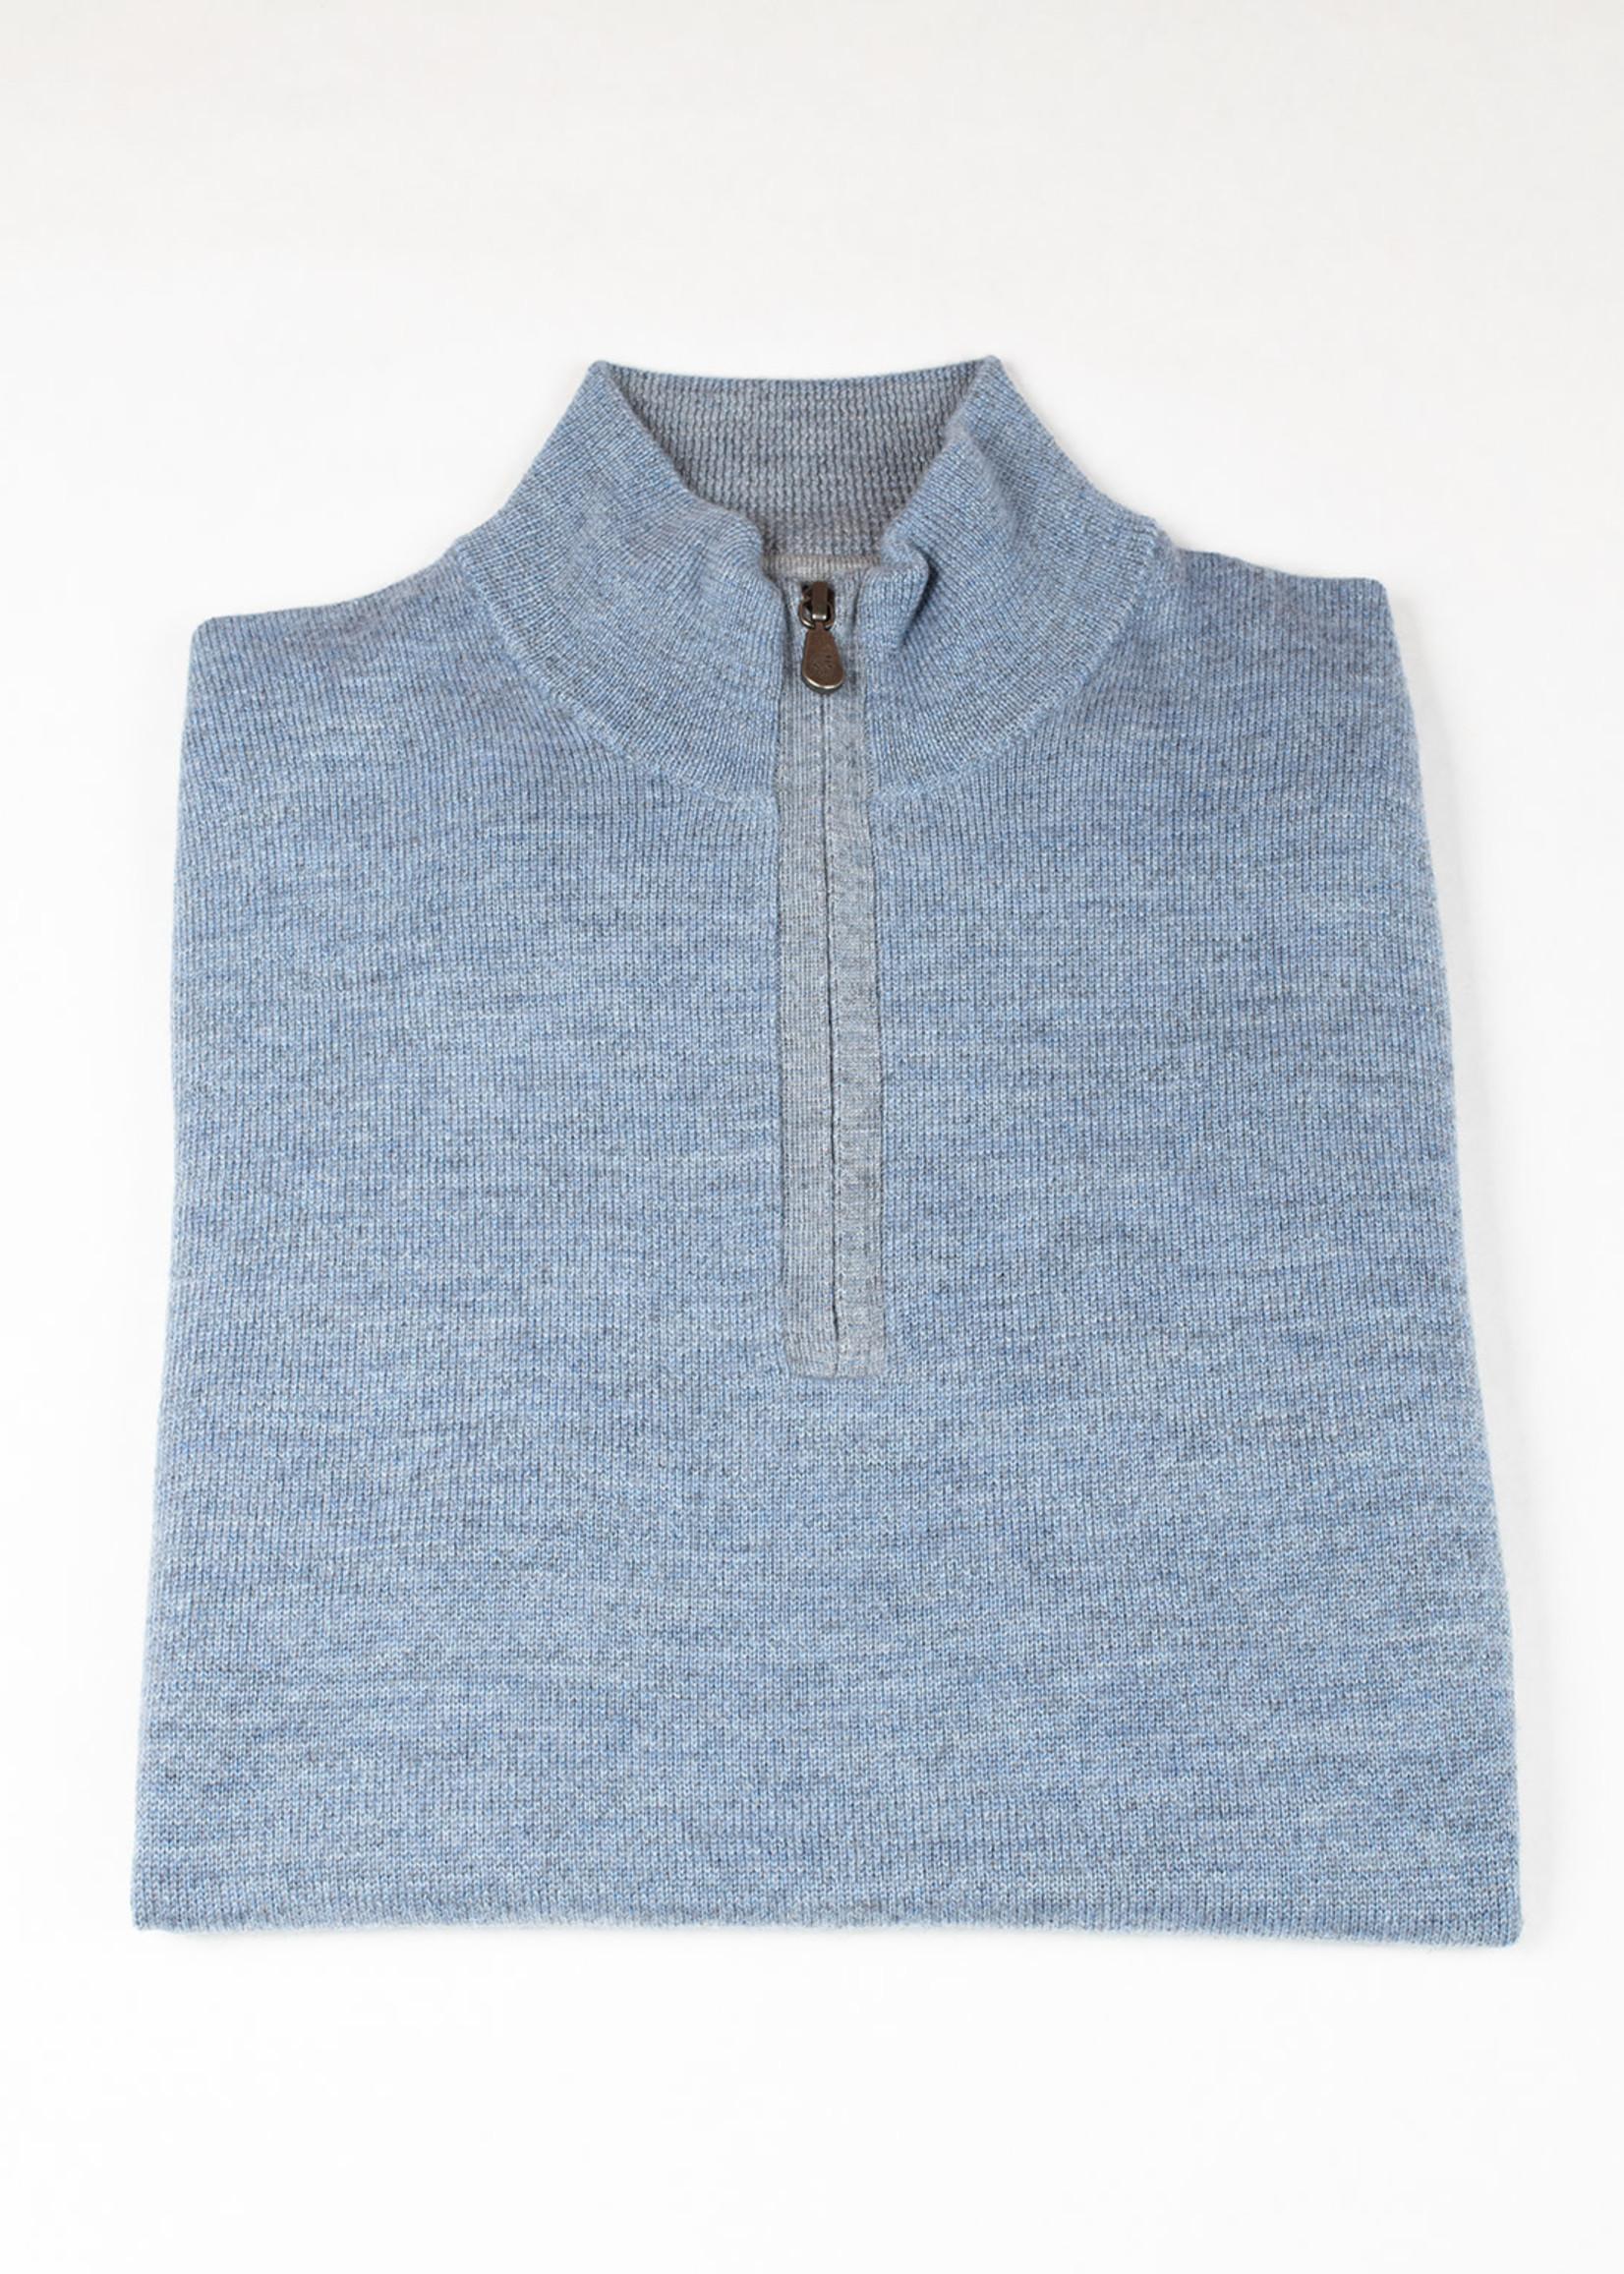 Raffi Storm Merino Wool 1/4 Zip by Raffi